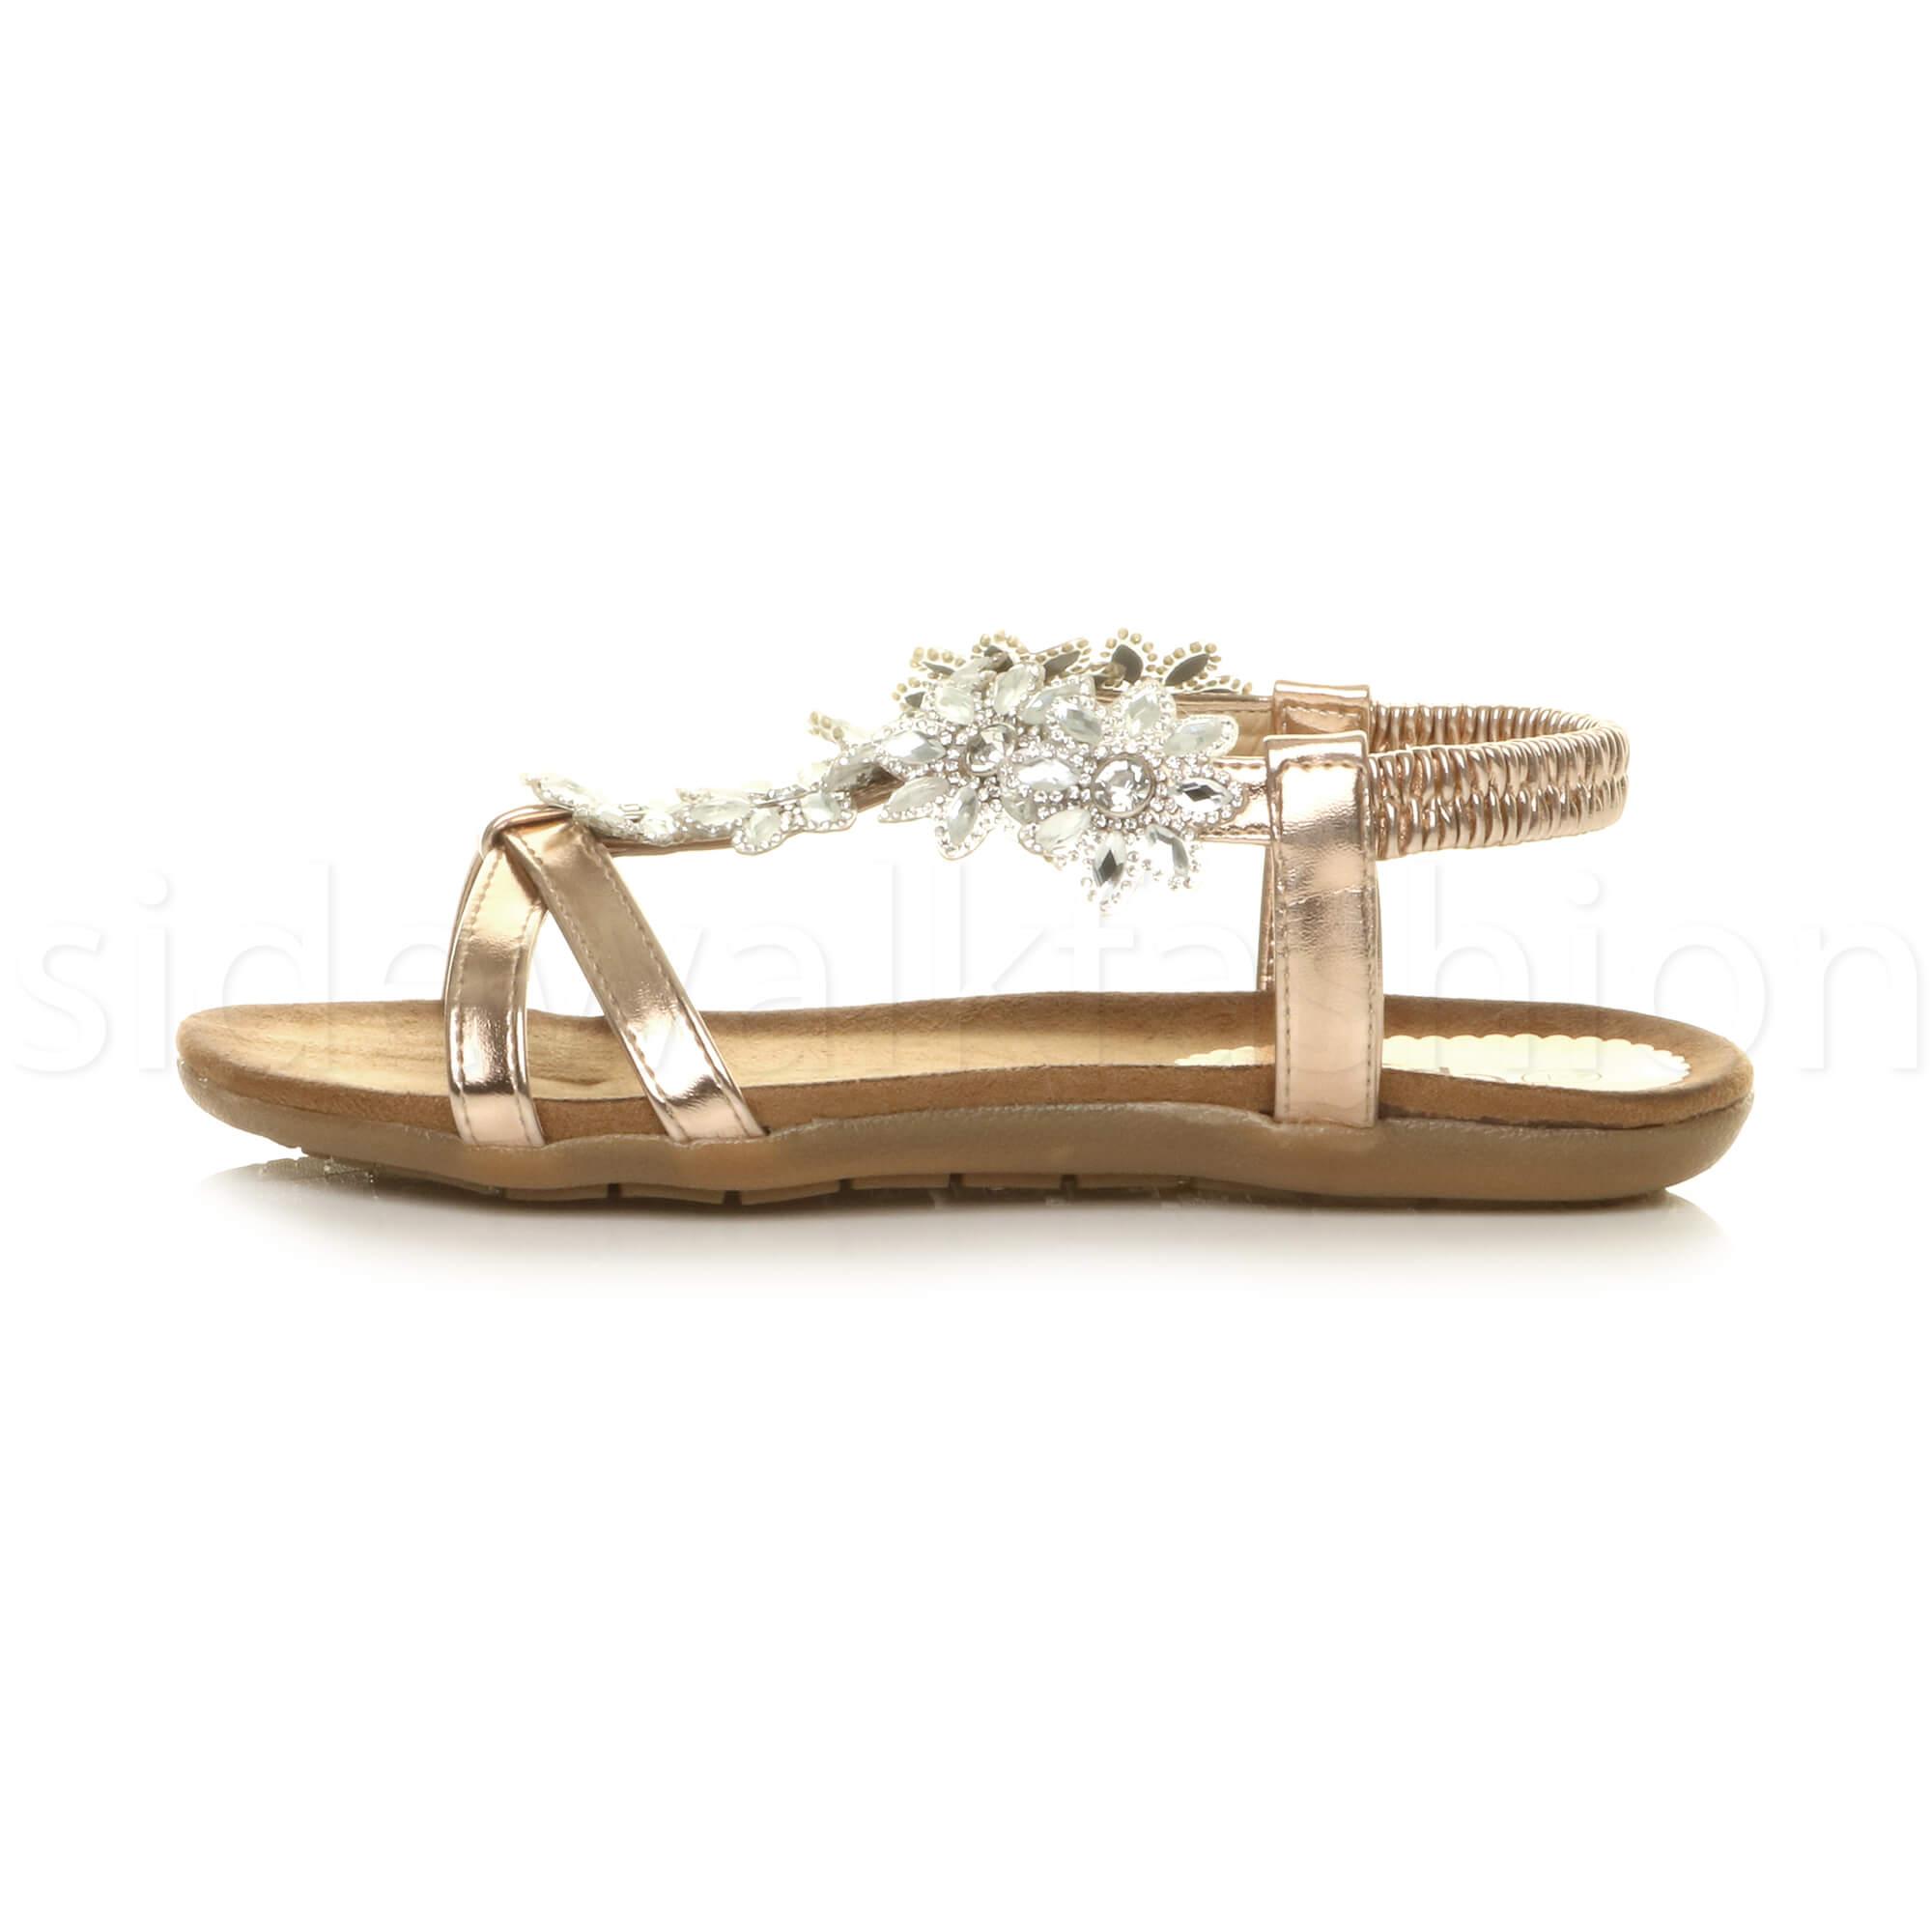 3ada84e69789 Womens ladies flat wedge flower t-bar gem diamante summer comfort ...